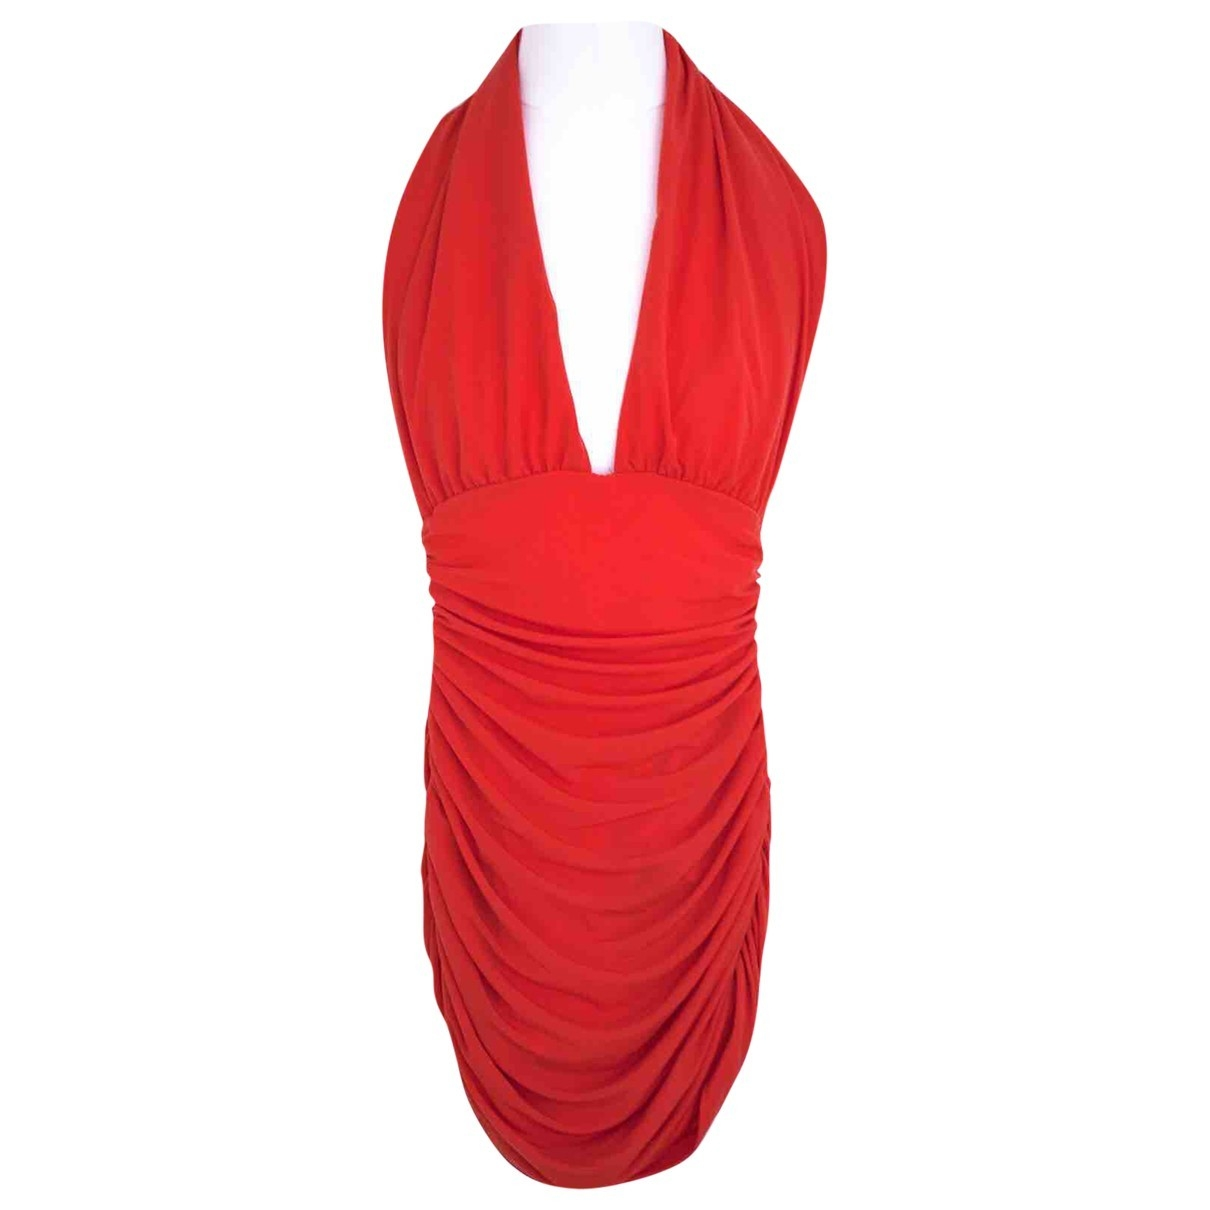 Norma Kamali \N Badeanzug in  Rot Polyester